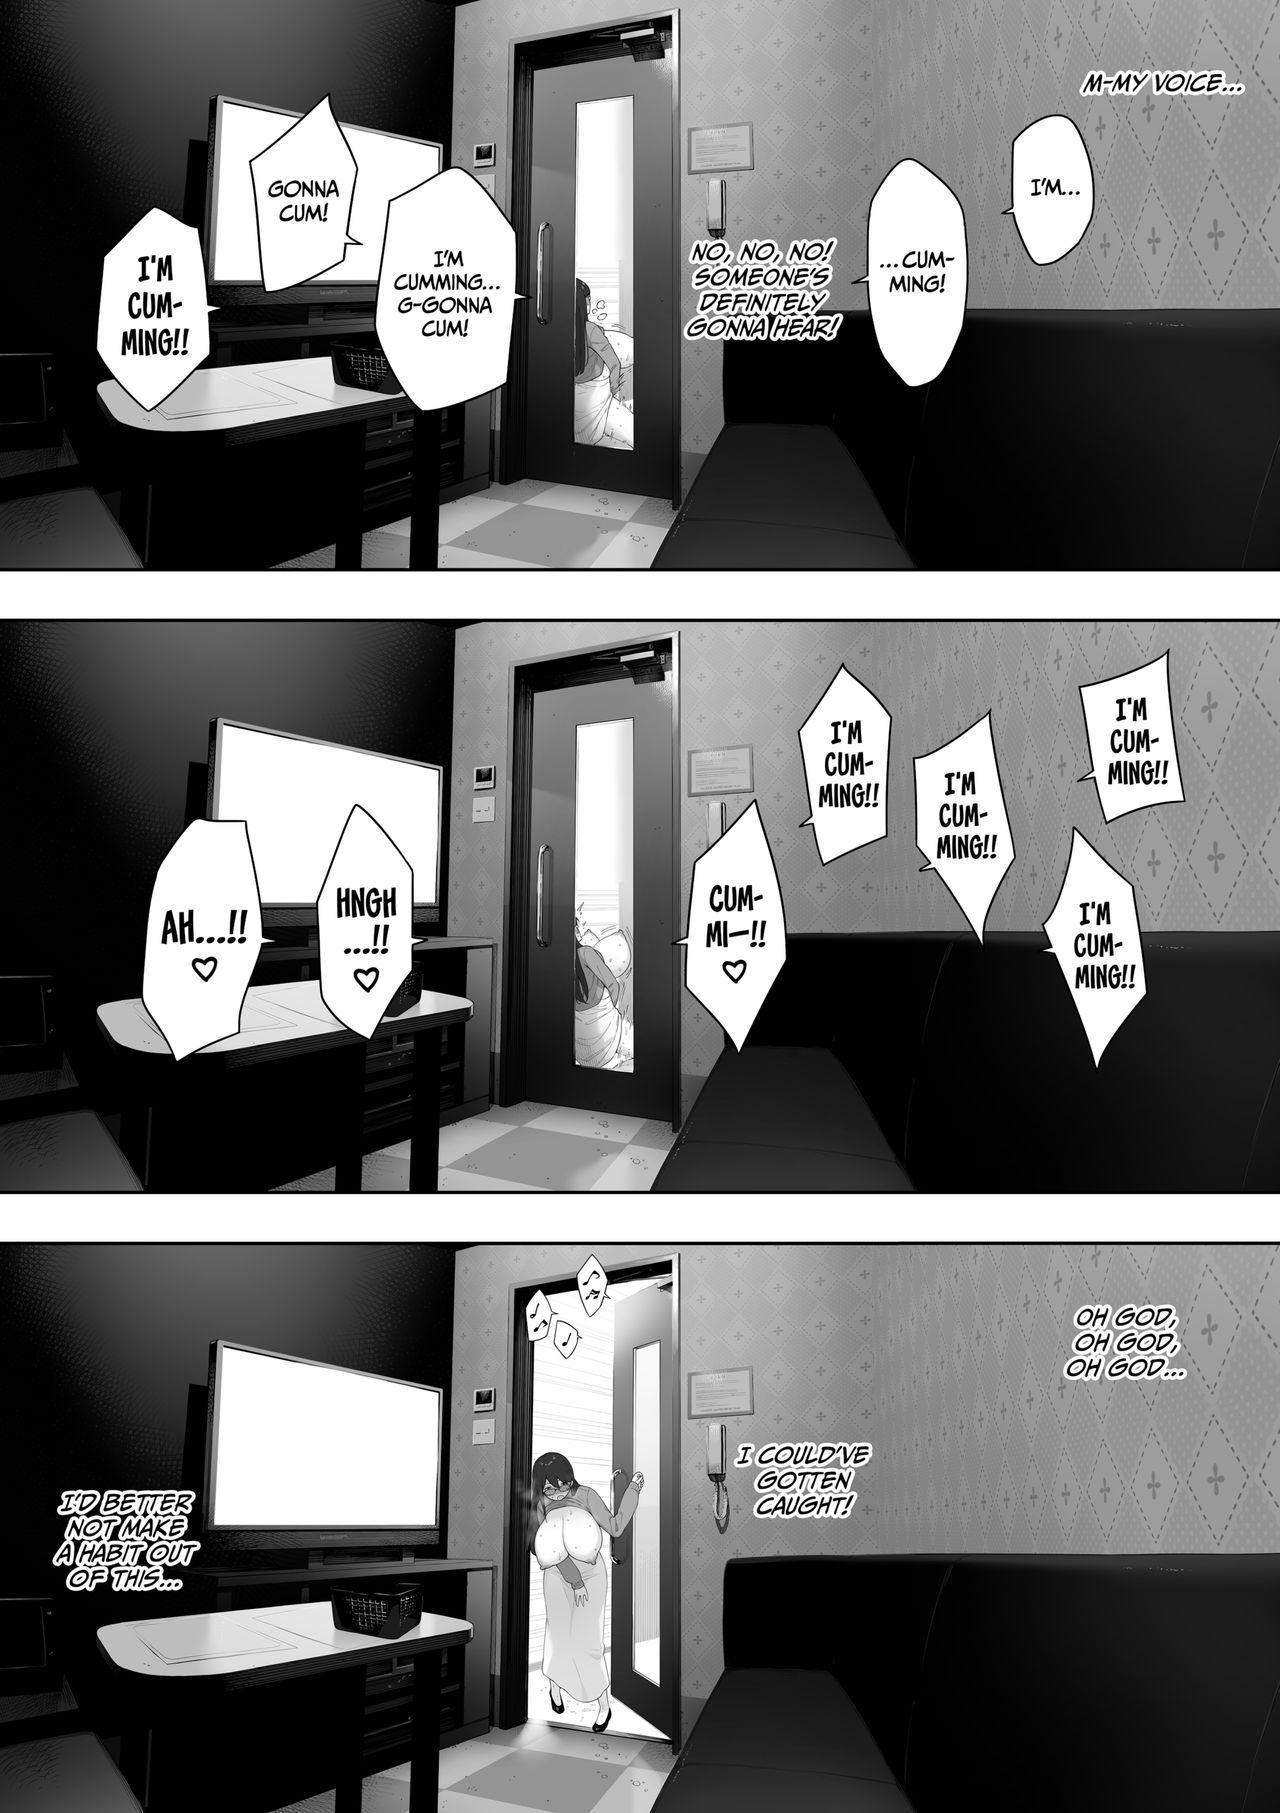 [NT Labo (NT Robo)] Aisai, Doui no Ue, Netorare Roshutsu | [NT Labo(NT Robo)] Cucked With_My Consent My Exhibitionist Wife [English] 40